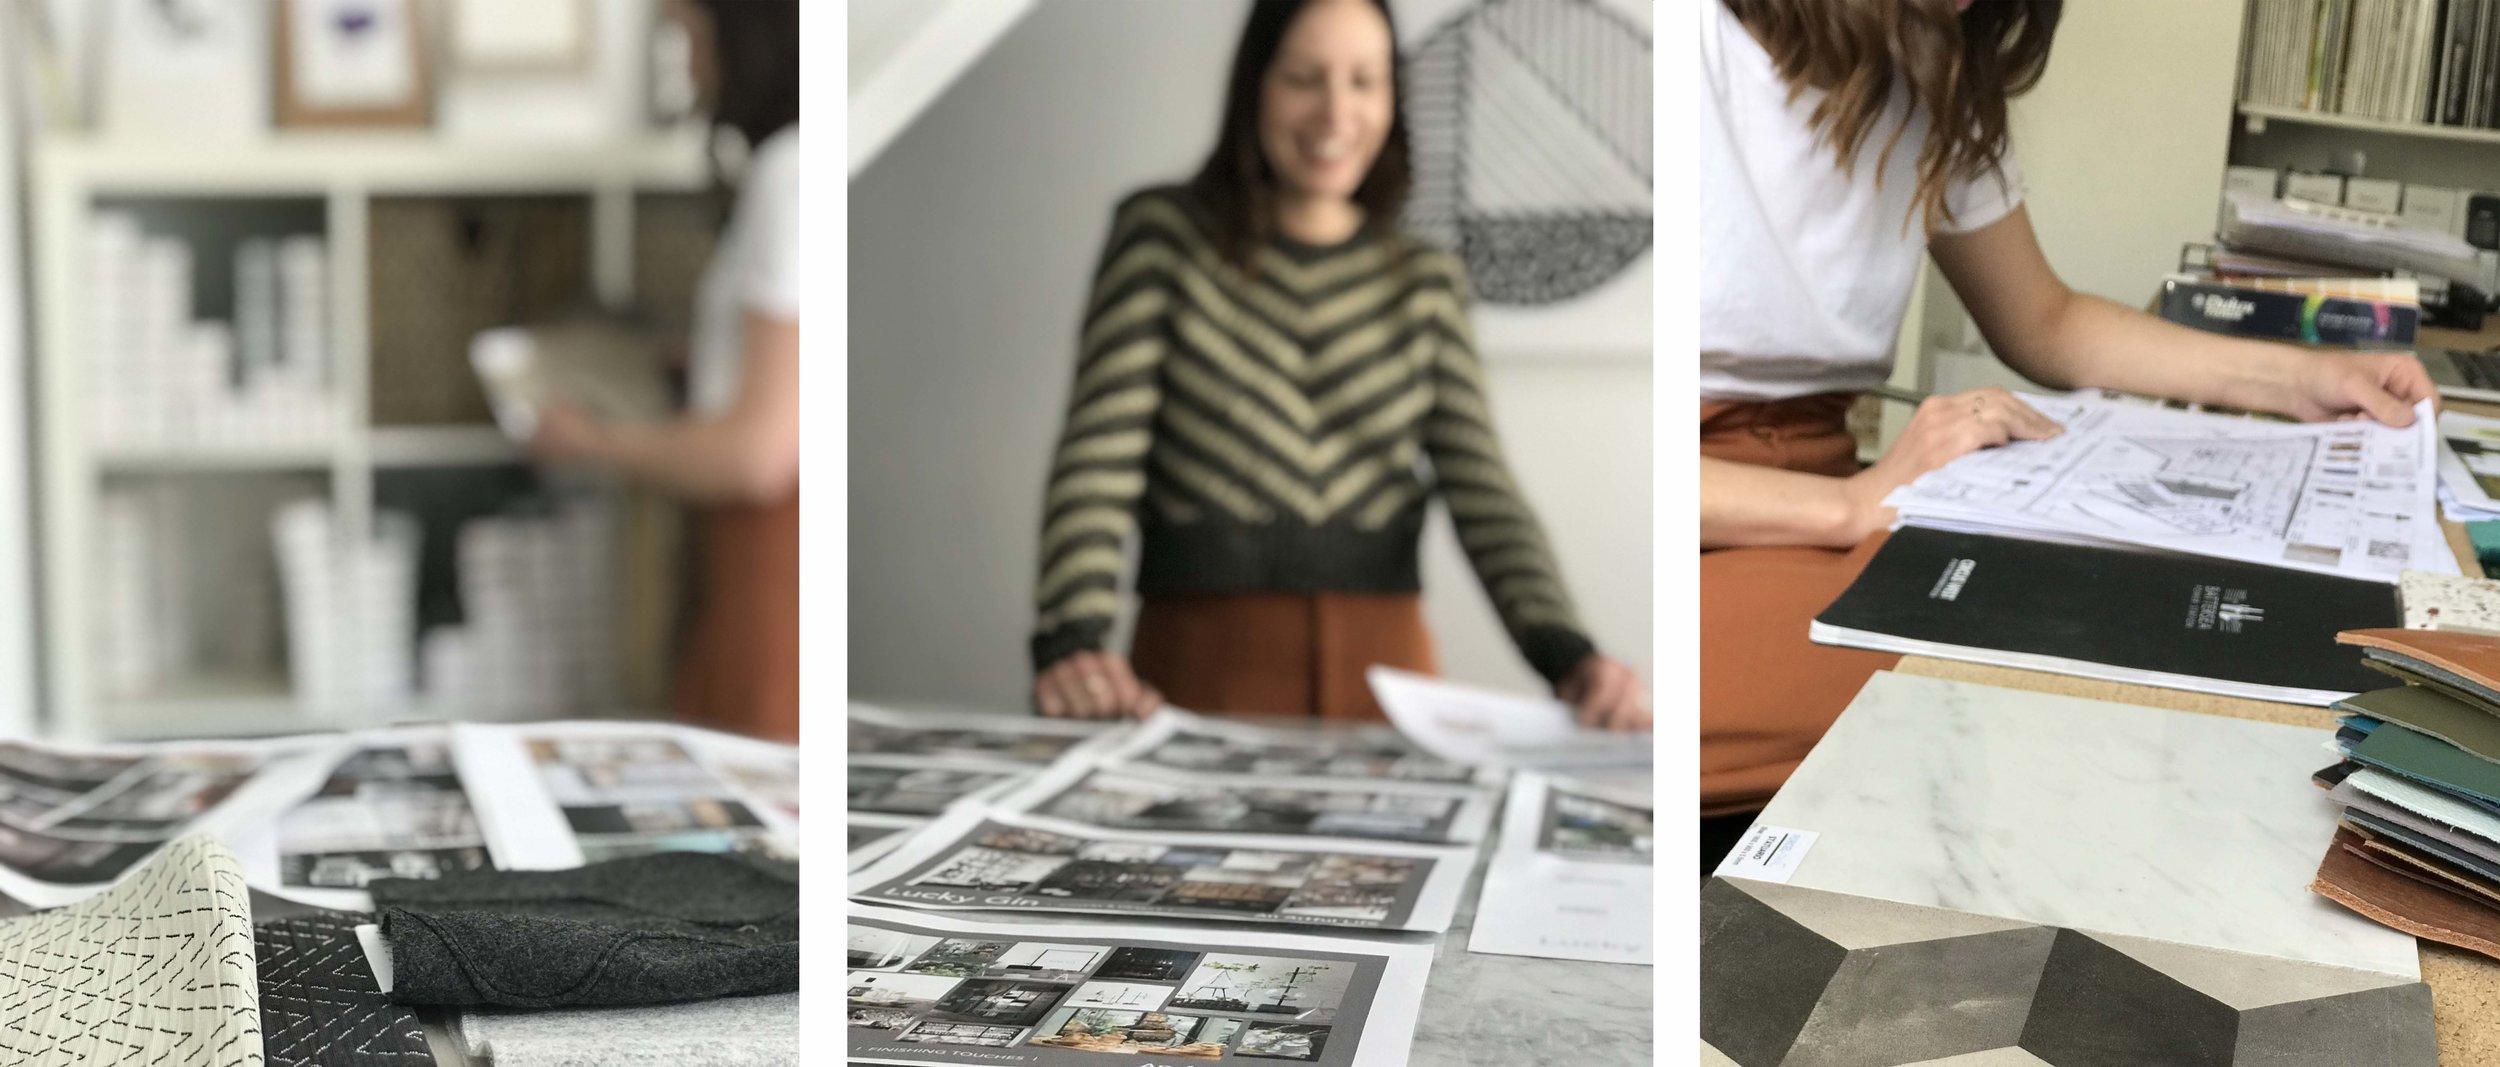 Kate Whitfield. Interior architect. Interior designer.